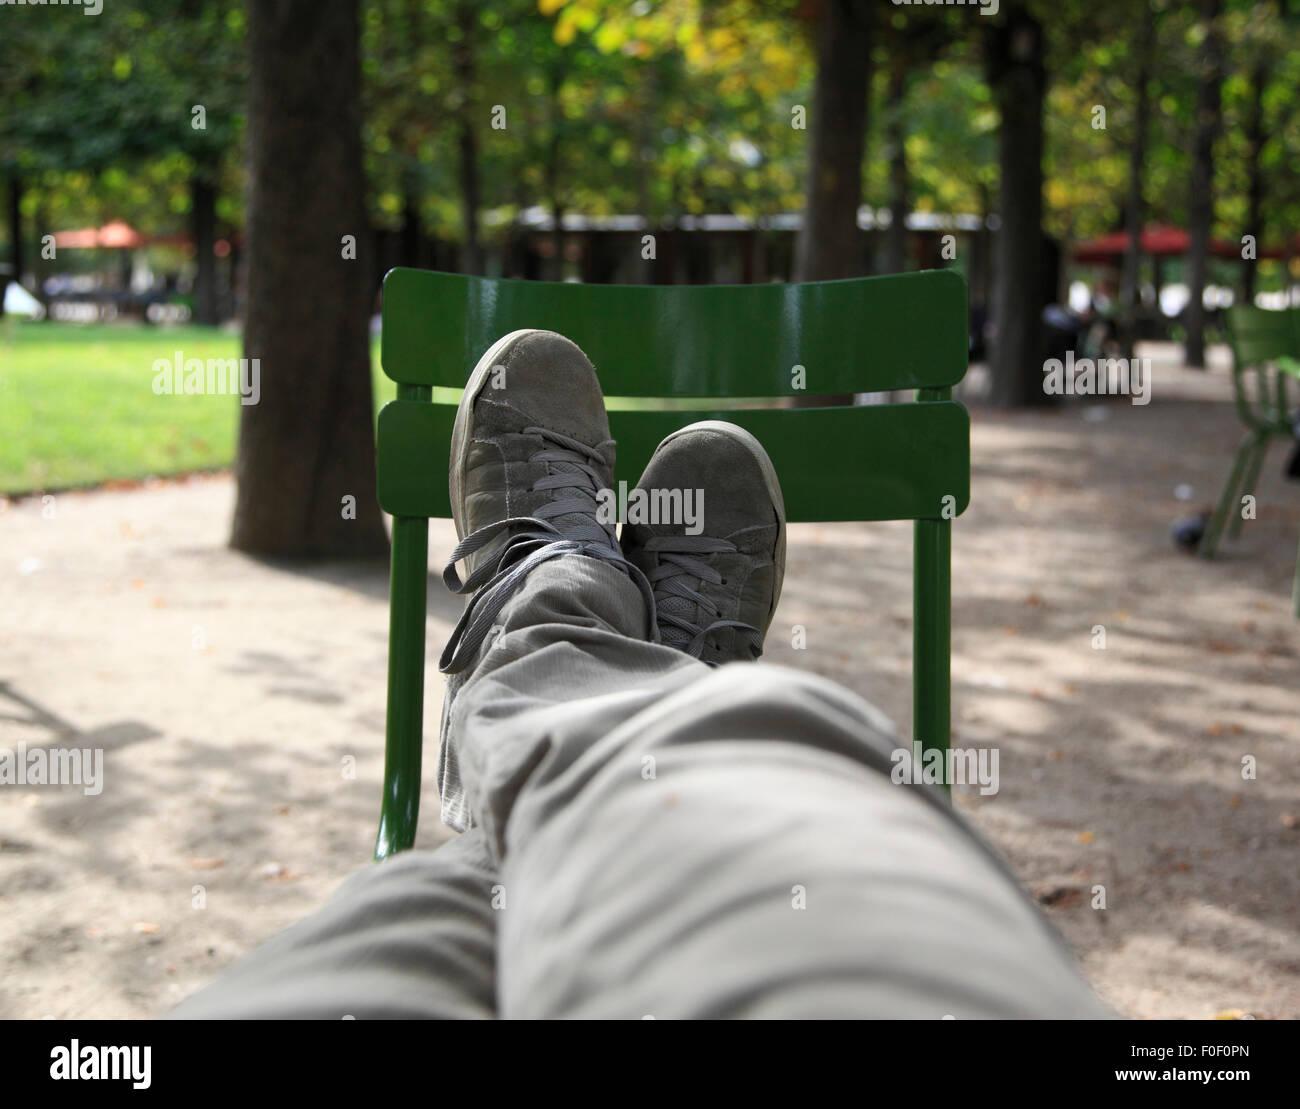 Feet up in a Parisian park, Paris, France, Europe - Stock Image